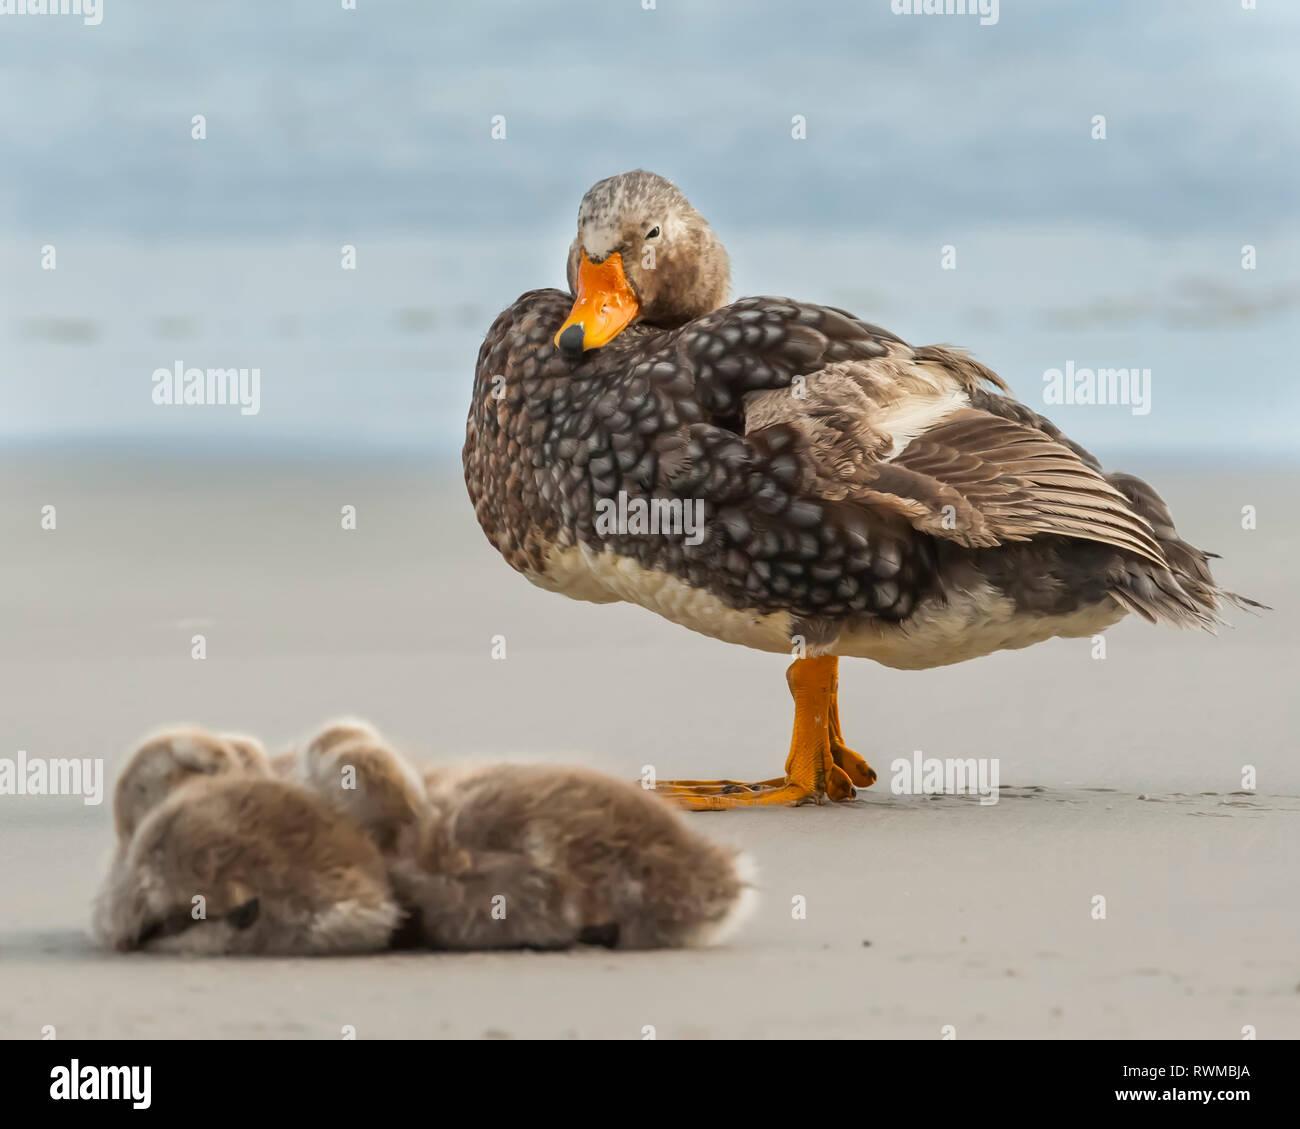 Falkland steamer duck (Tachyeres brachypterus) with chicks on the beach; Saunders Island, Falkland Islands - Stock Image